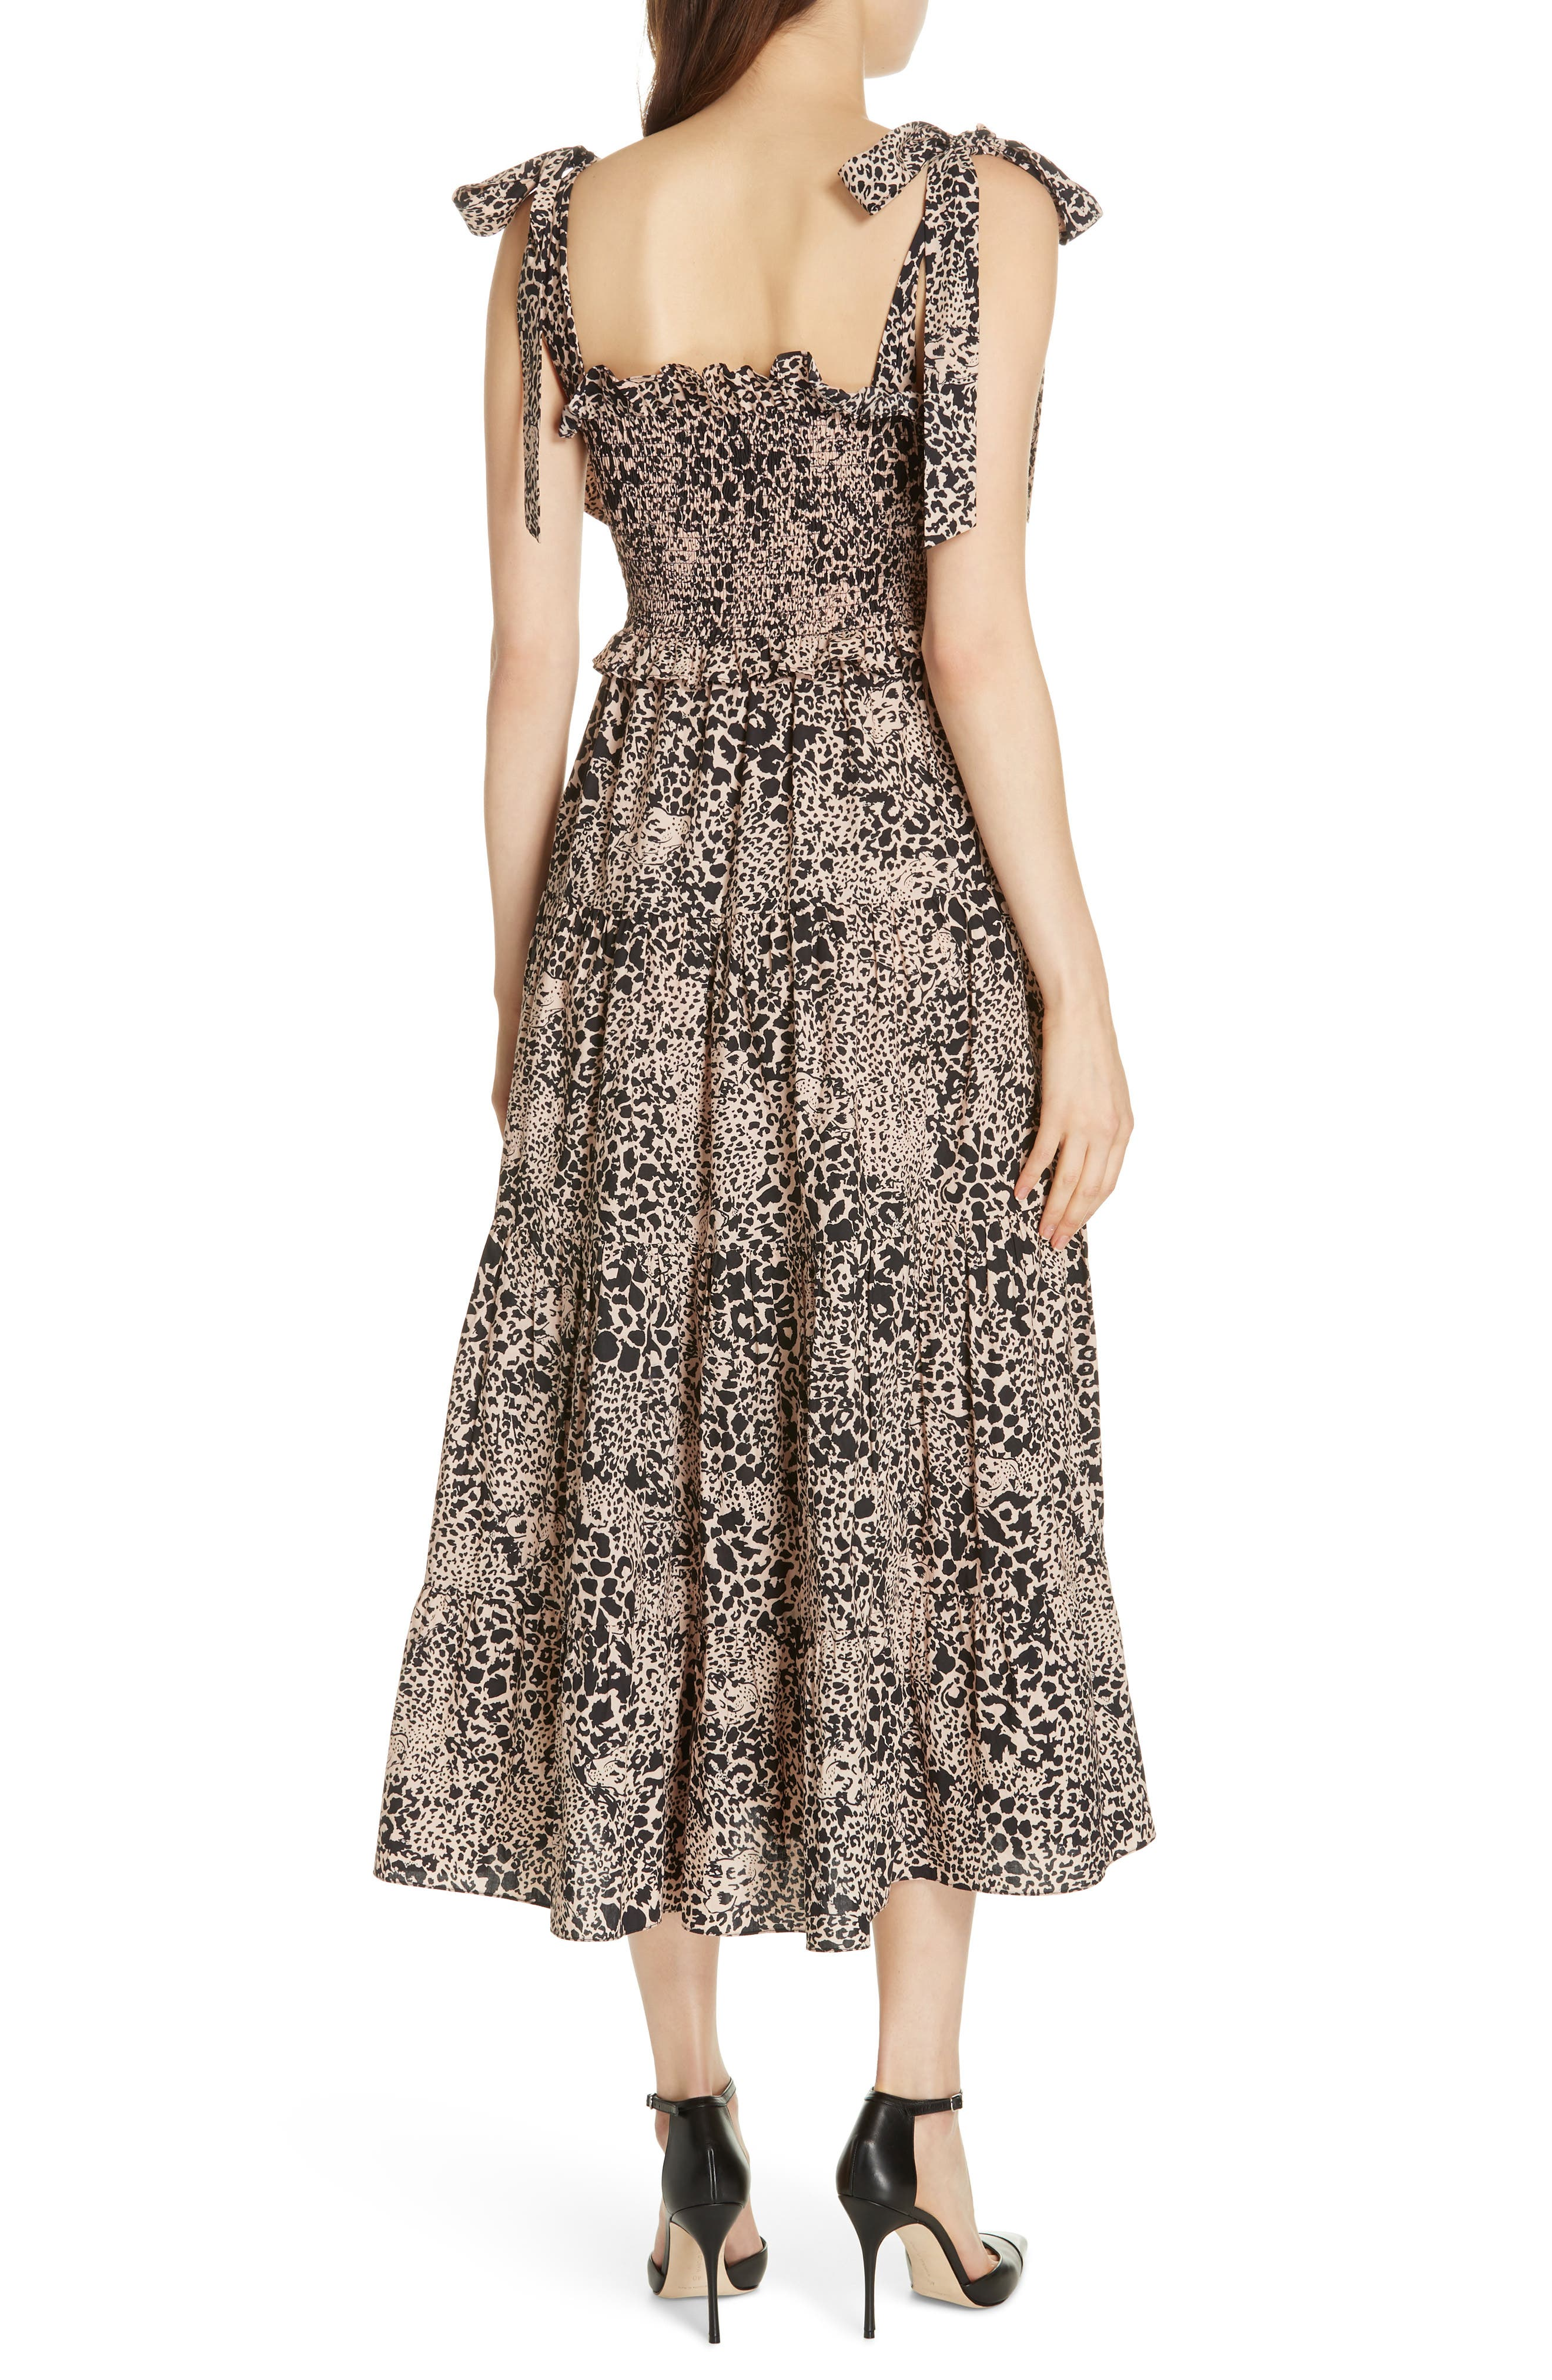 Leopard Print Smocked Dress,                             Alternate thumbnail 2, color,                             CHAMPAGNE COMBO